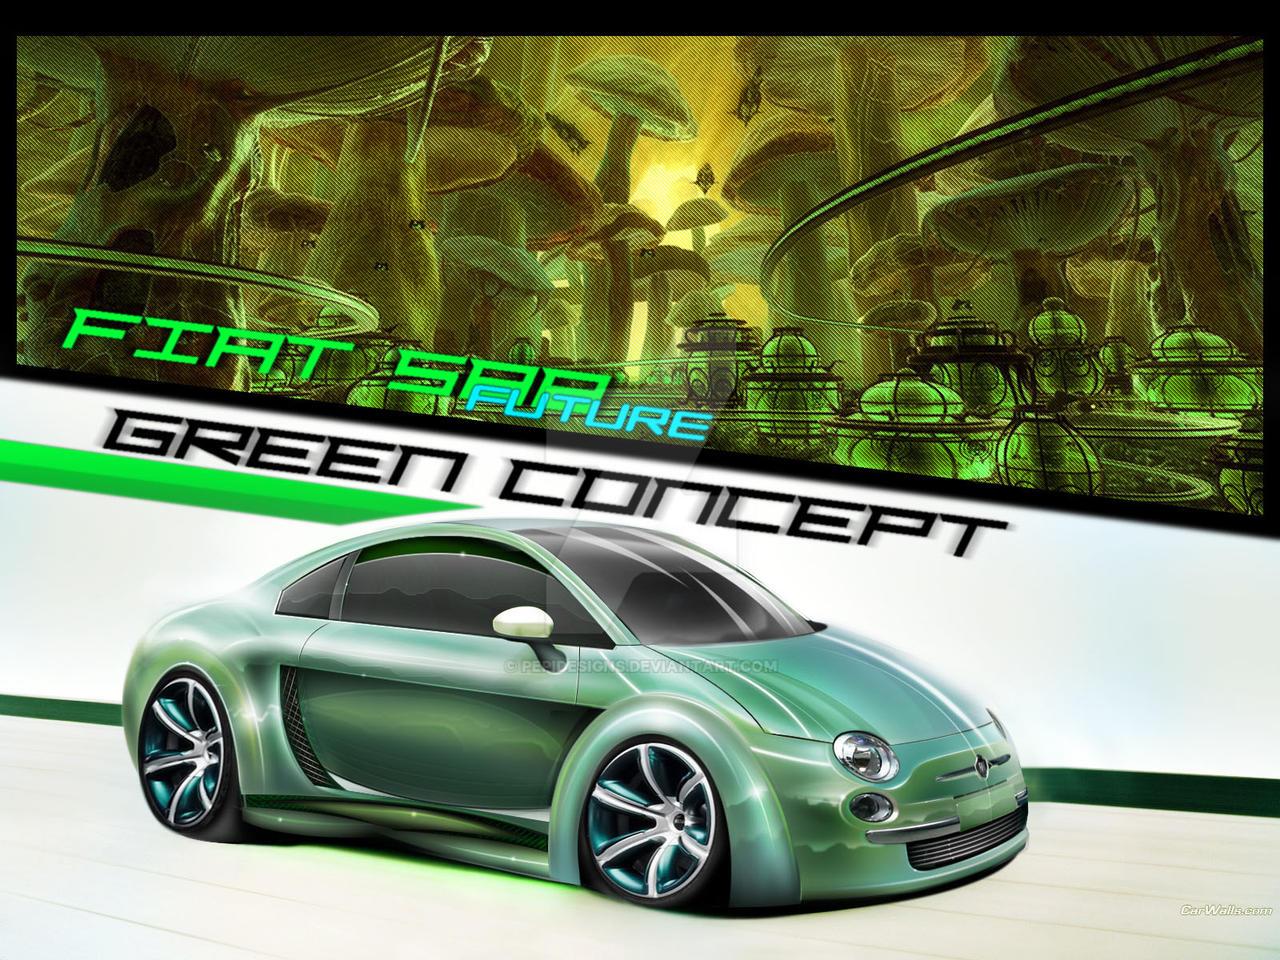 fiat 500 future green concept by pepidesigns on deviantart. Black Bedroom Furniture Sets. Home Design Ideas